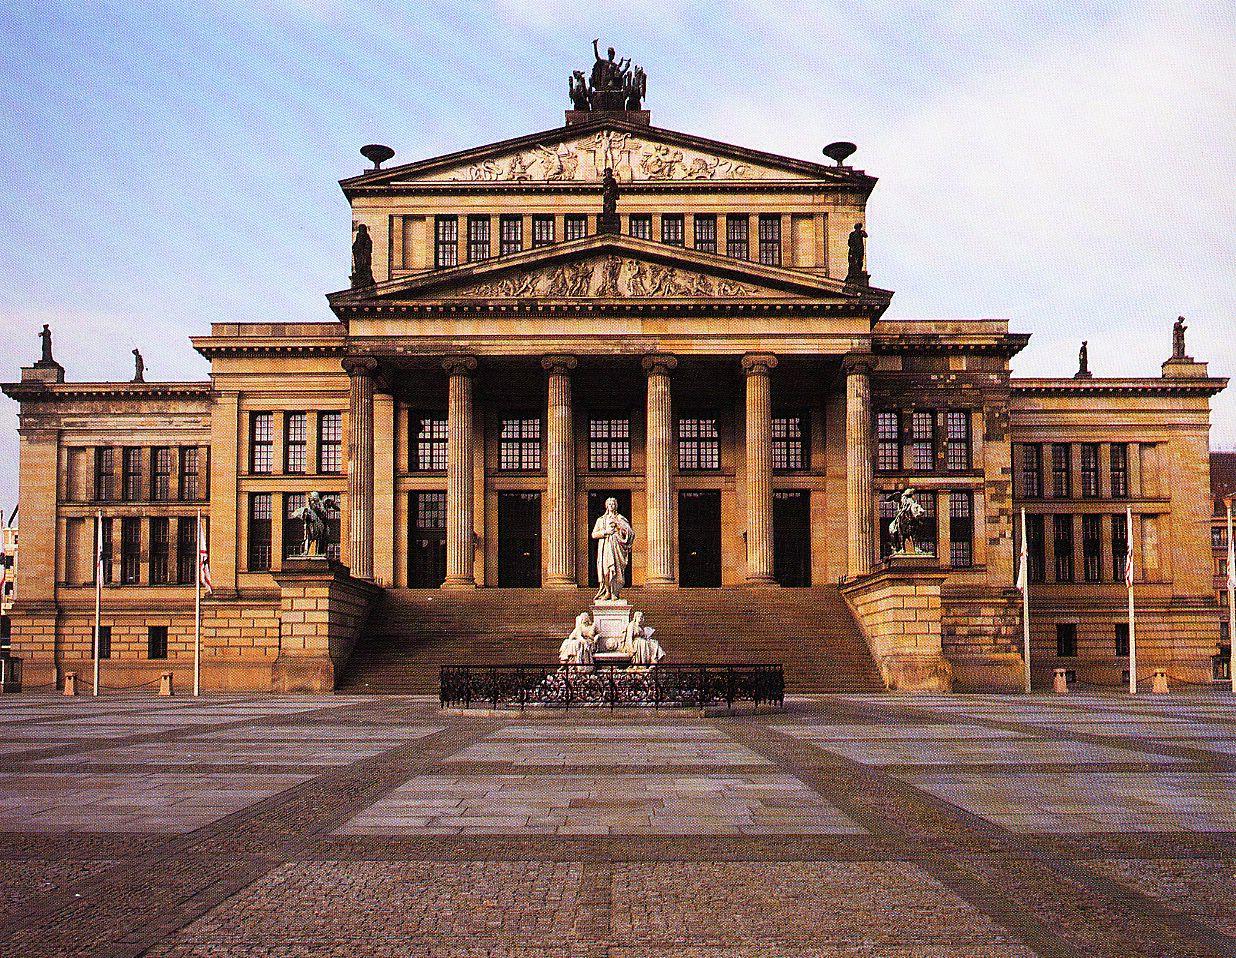 shinkel-teather berlin